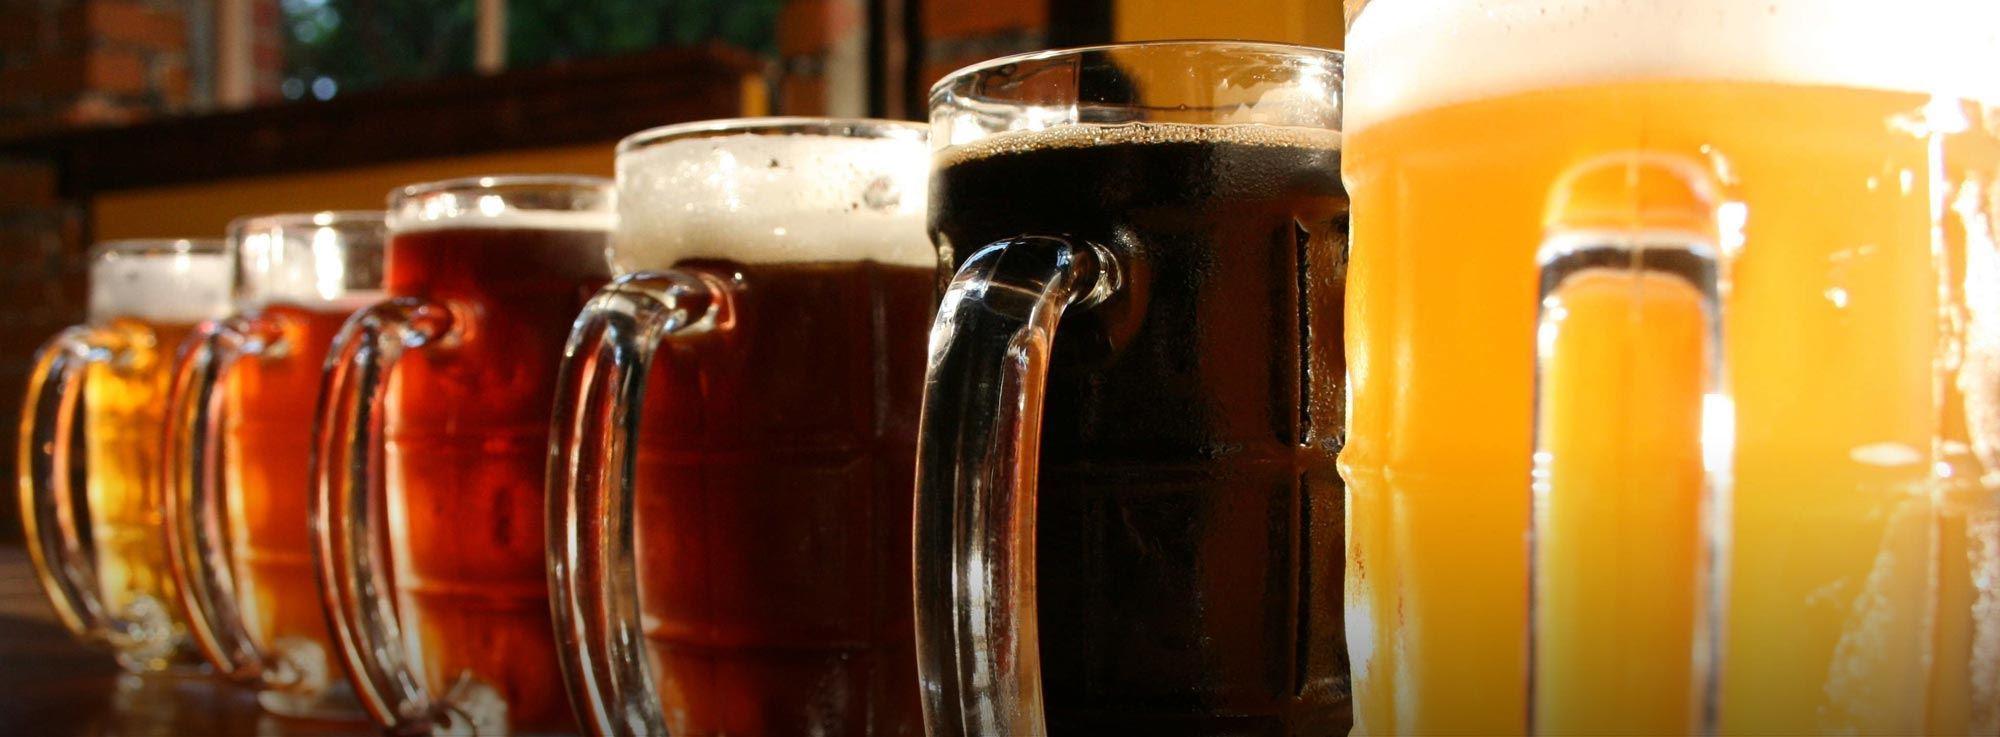 Mottola: Festa della birra